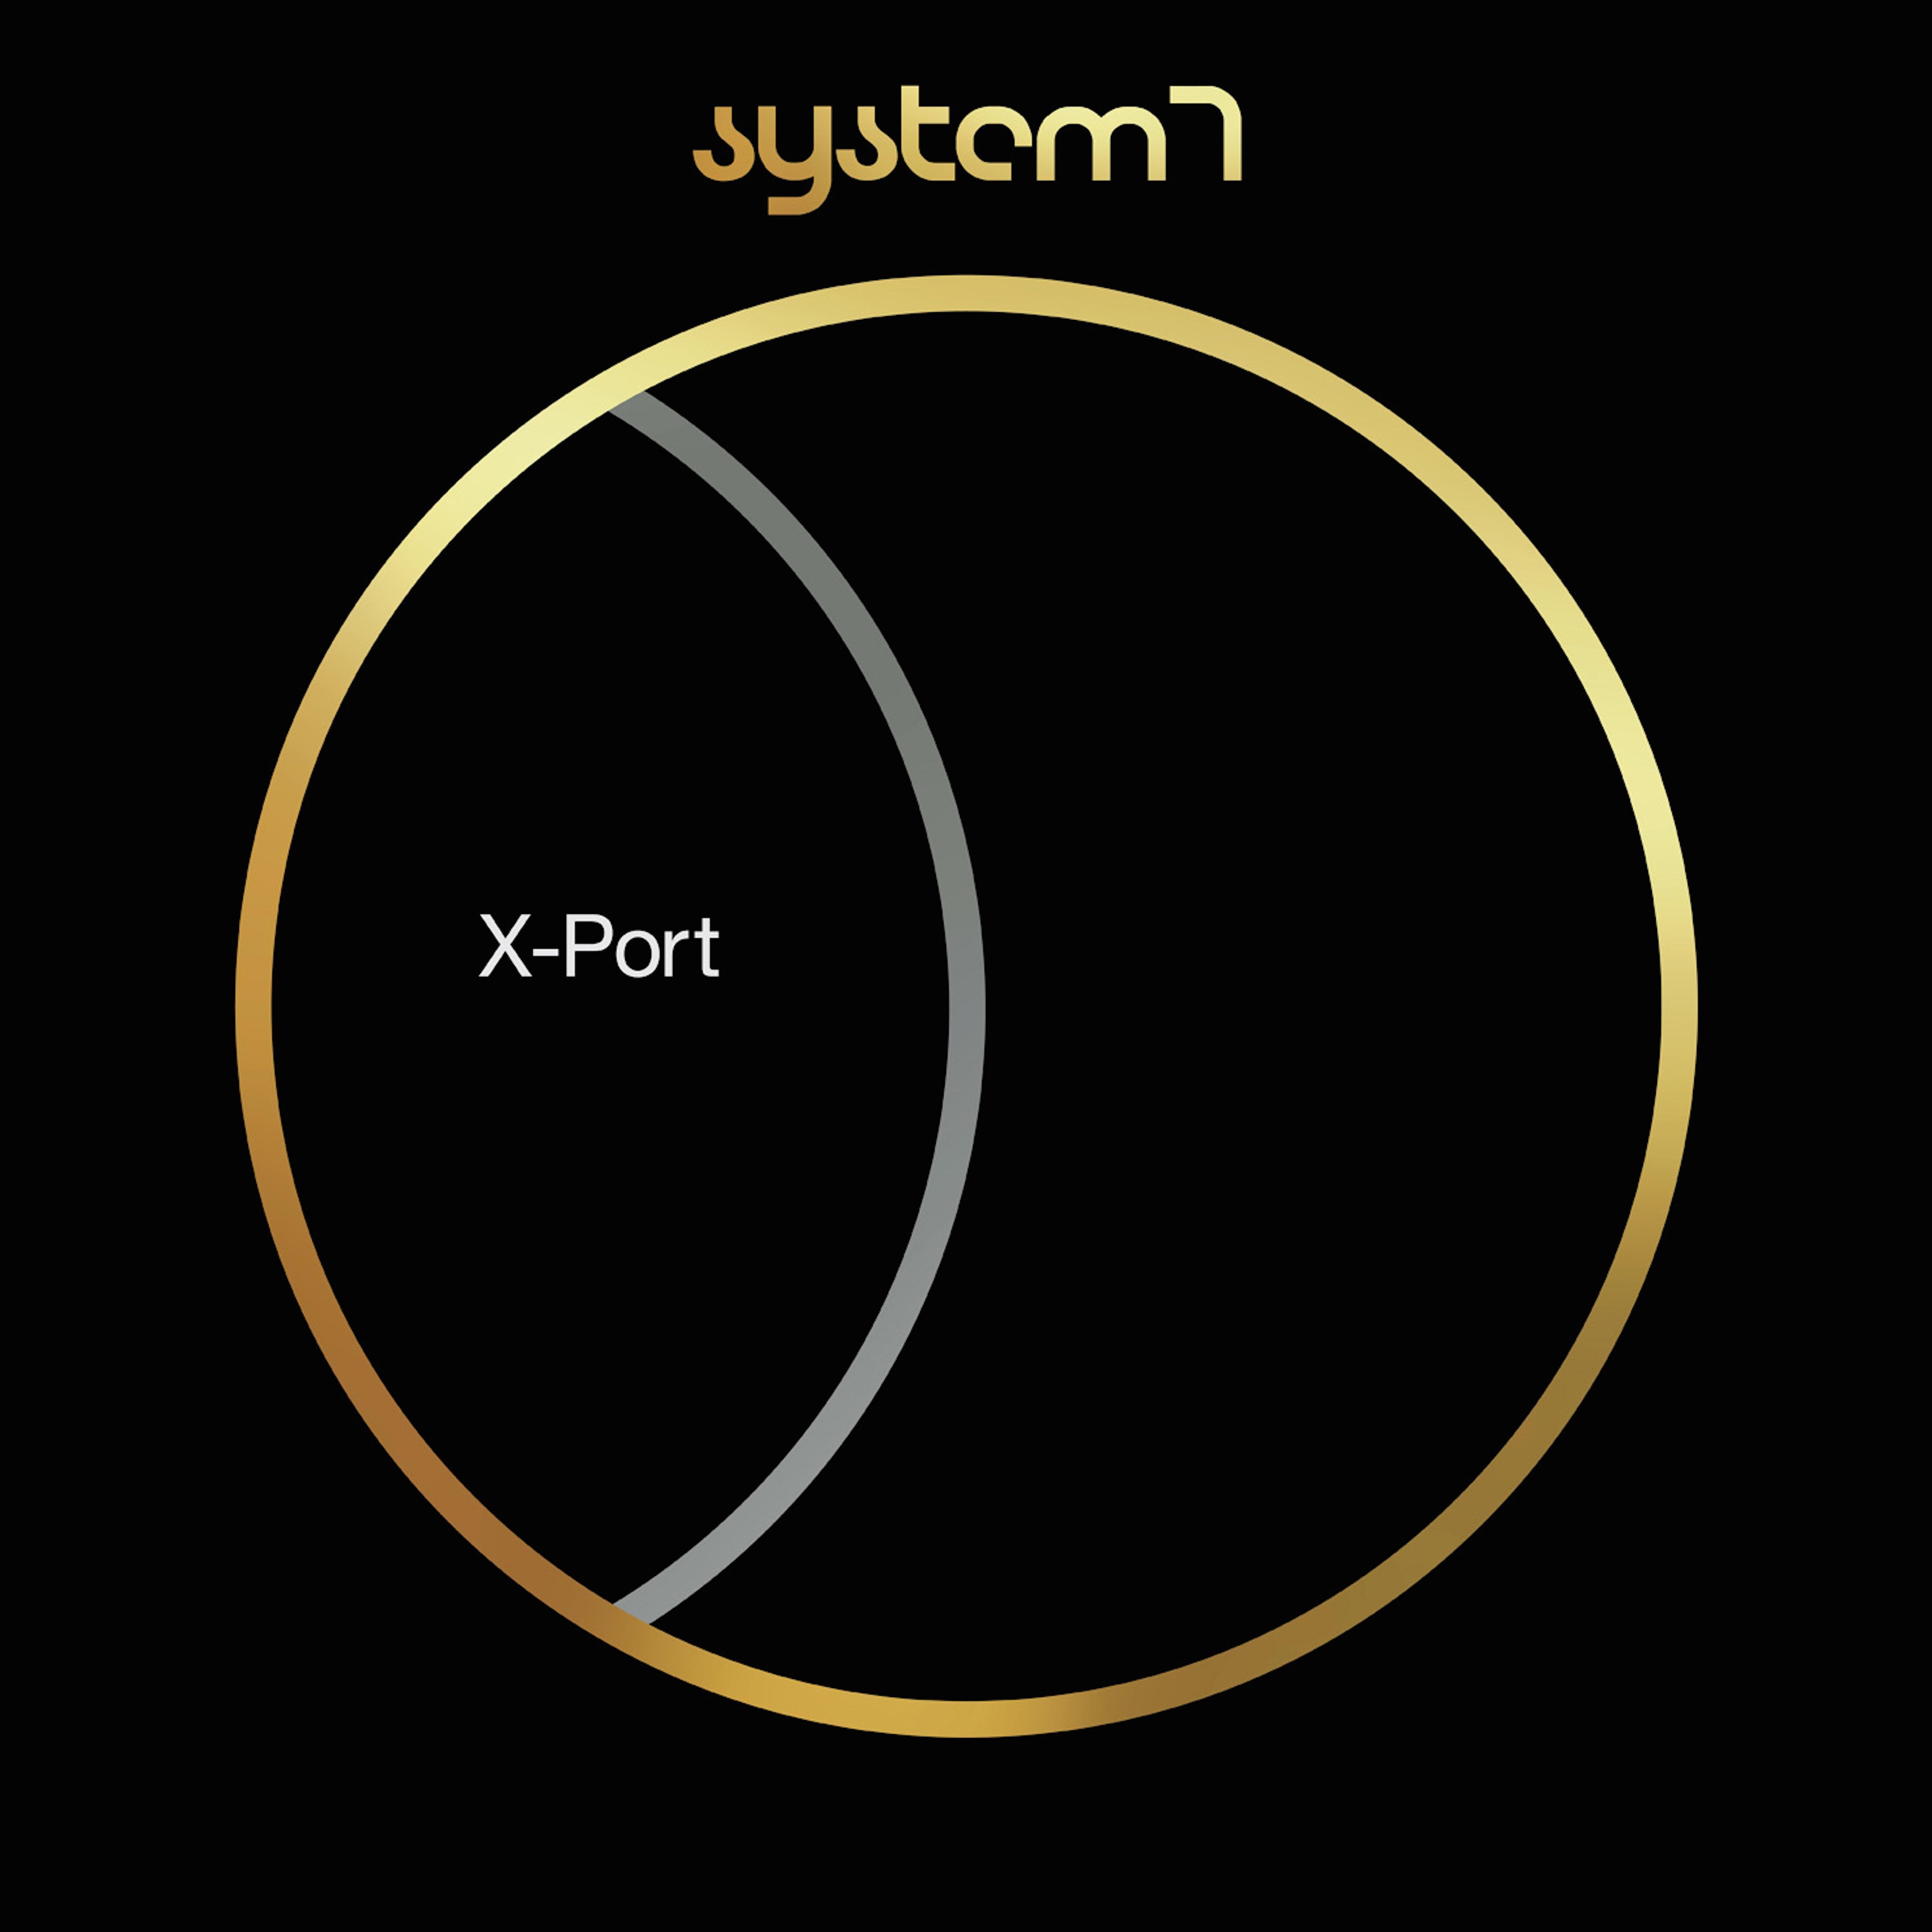 system7-x-port5000x5000.jpg